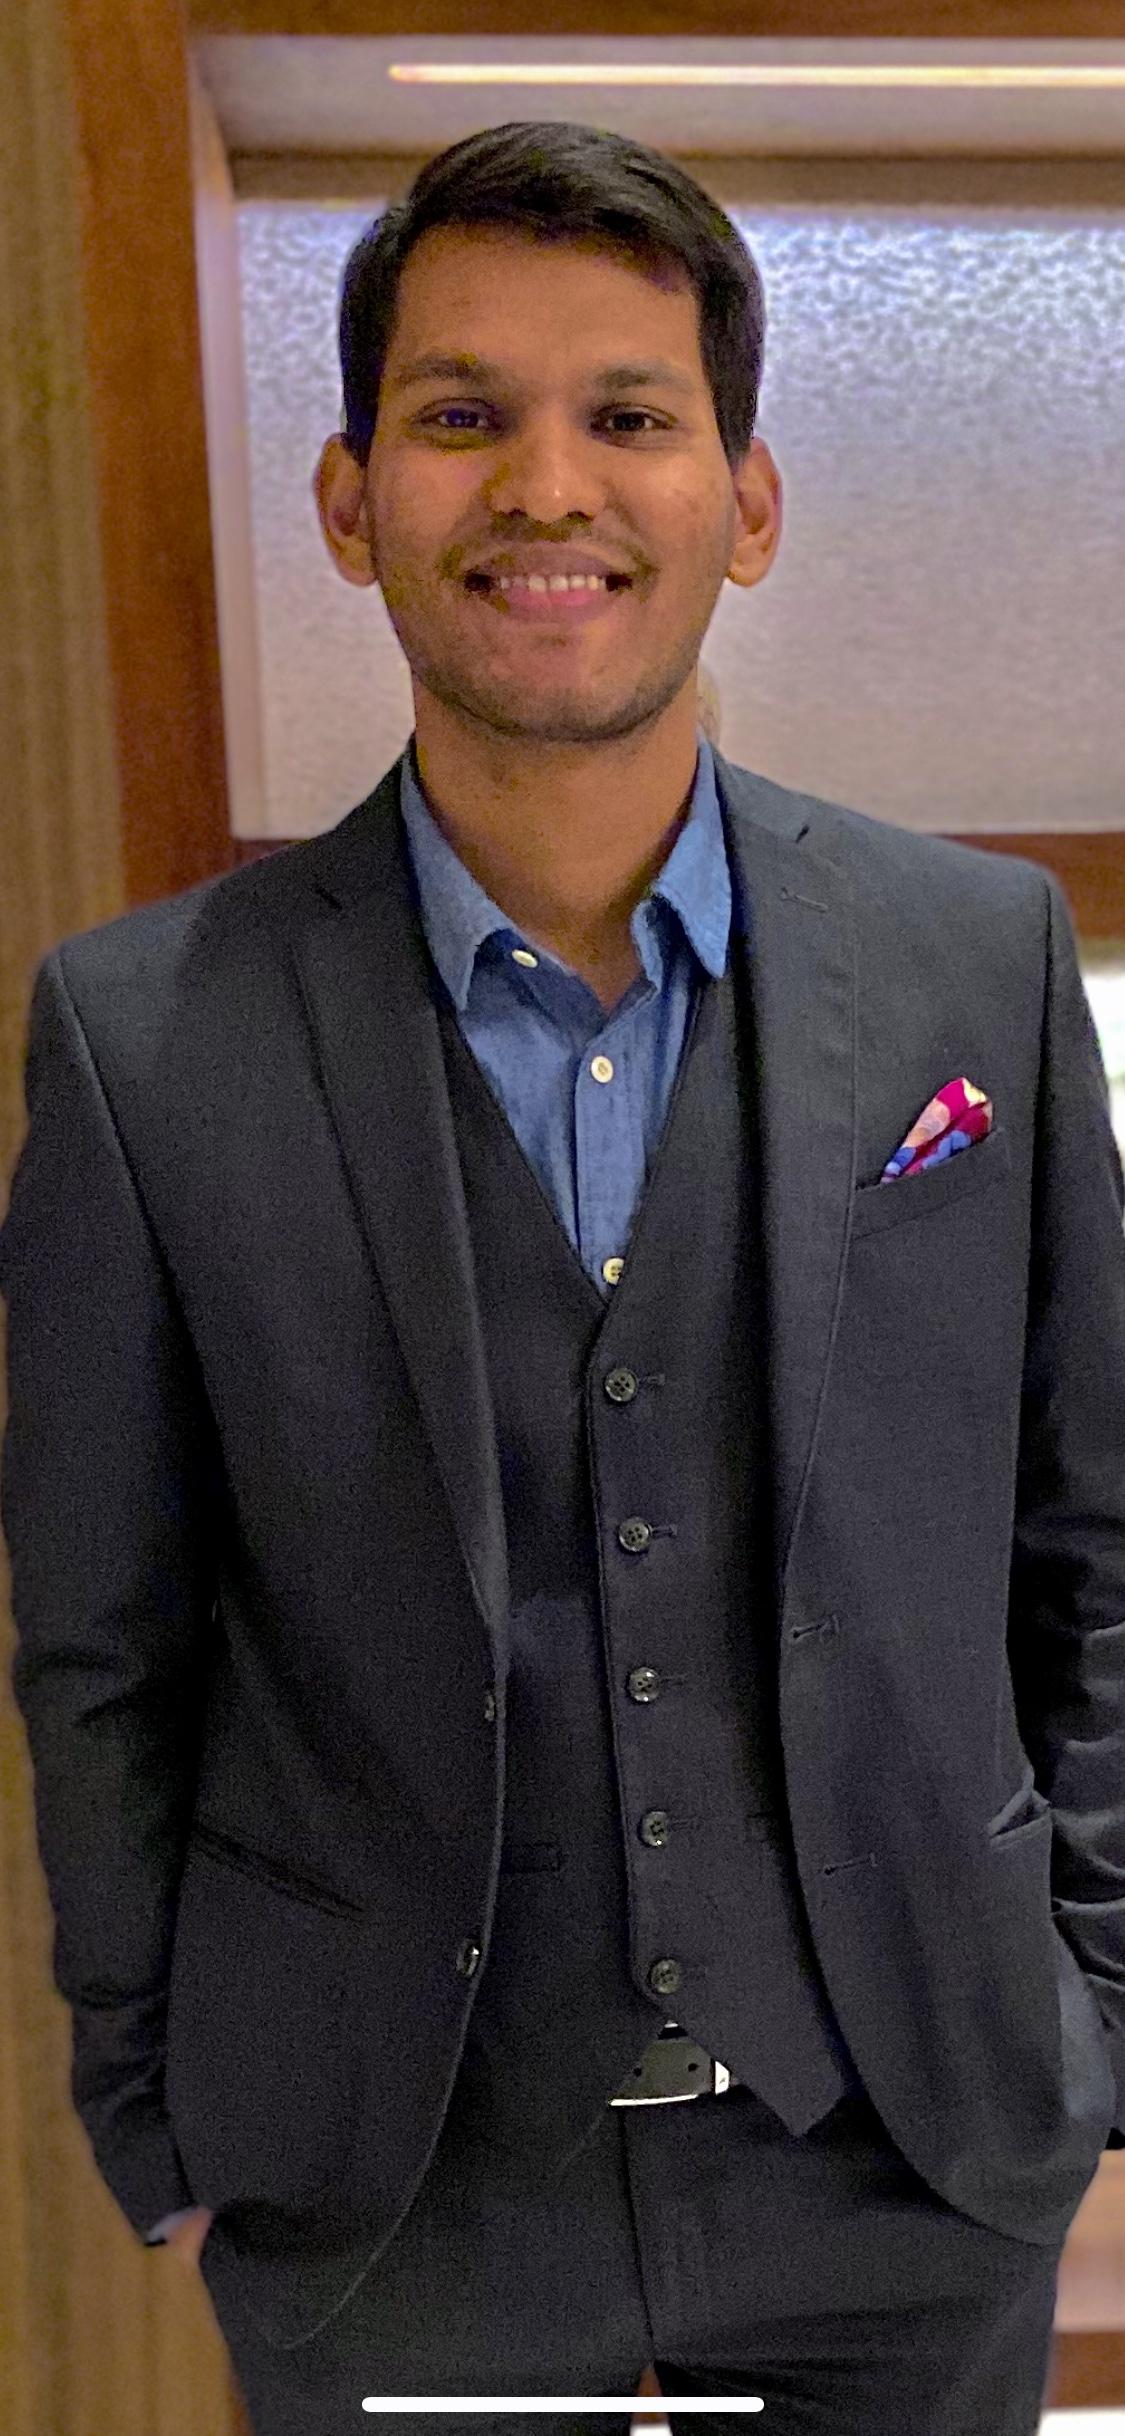 Dhruv Dwivedi